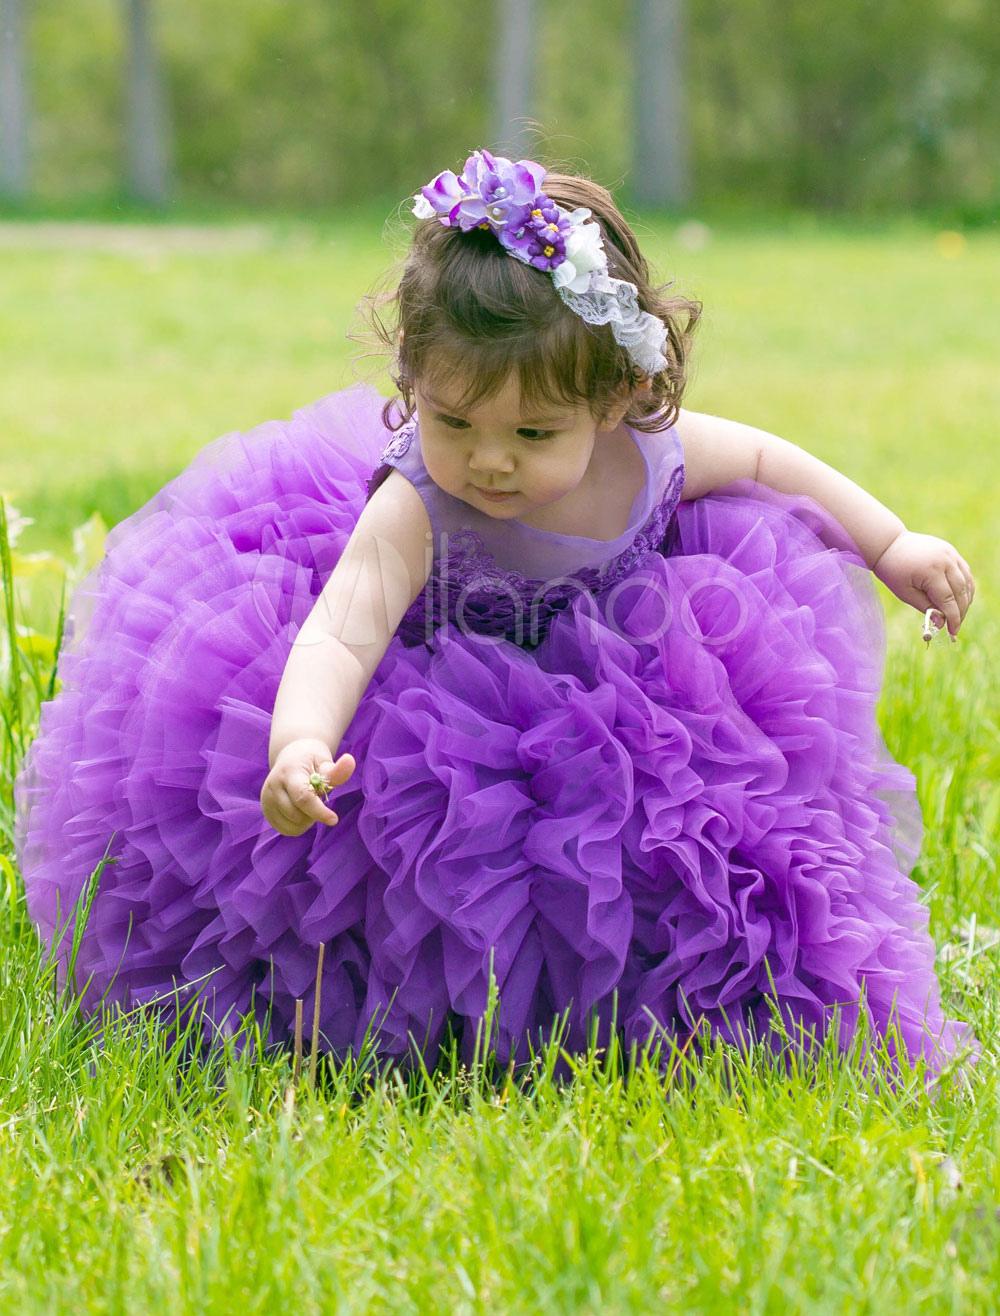 Lavender Toddler Dress Flower Girl Tutu Dress Ankle-length Ball Gown Prince Pageant Dress